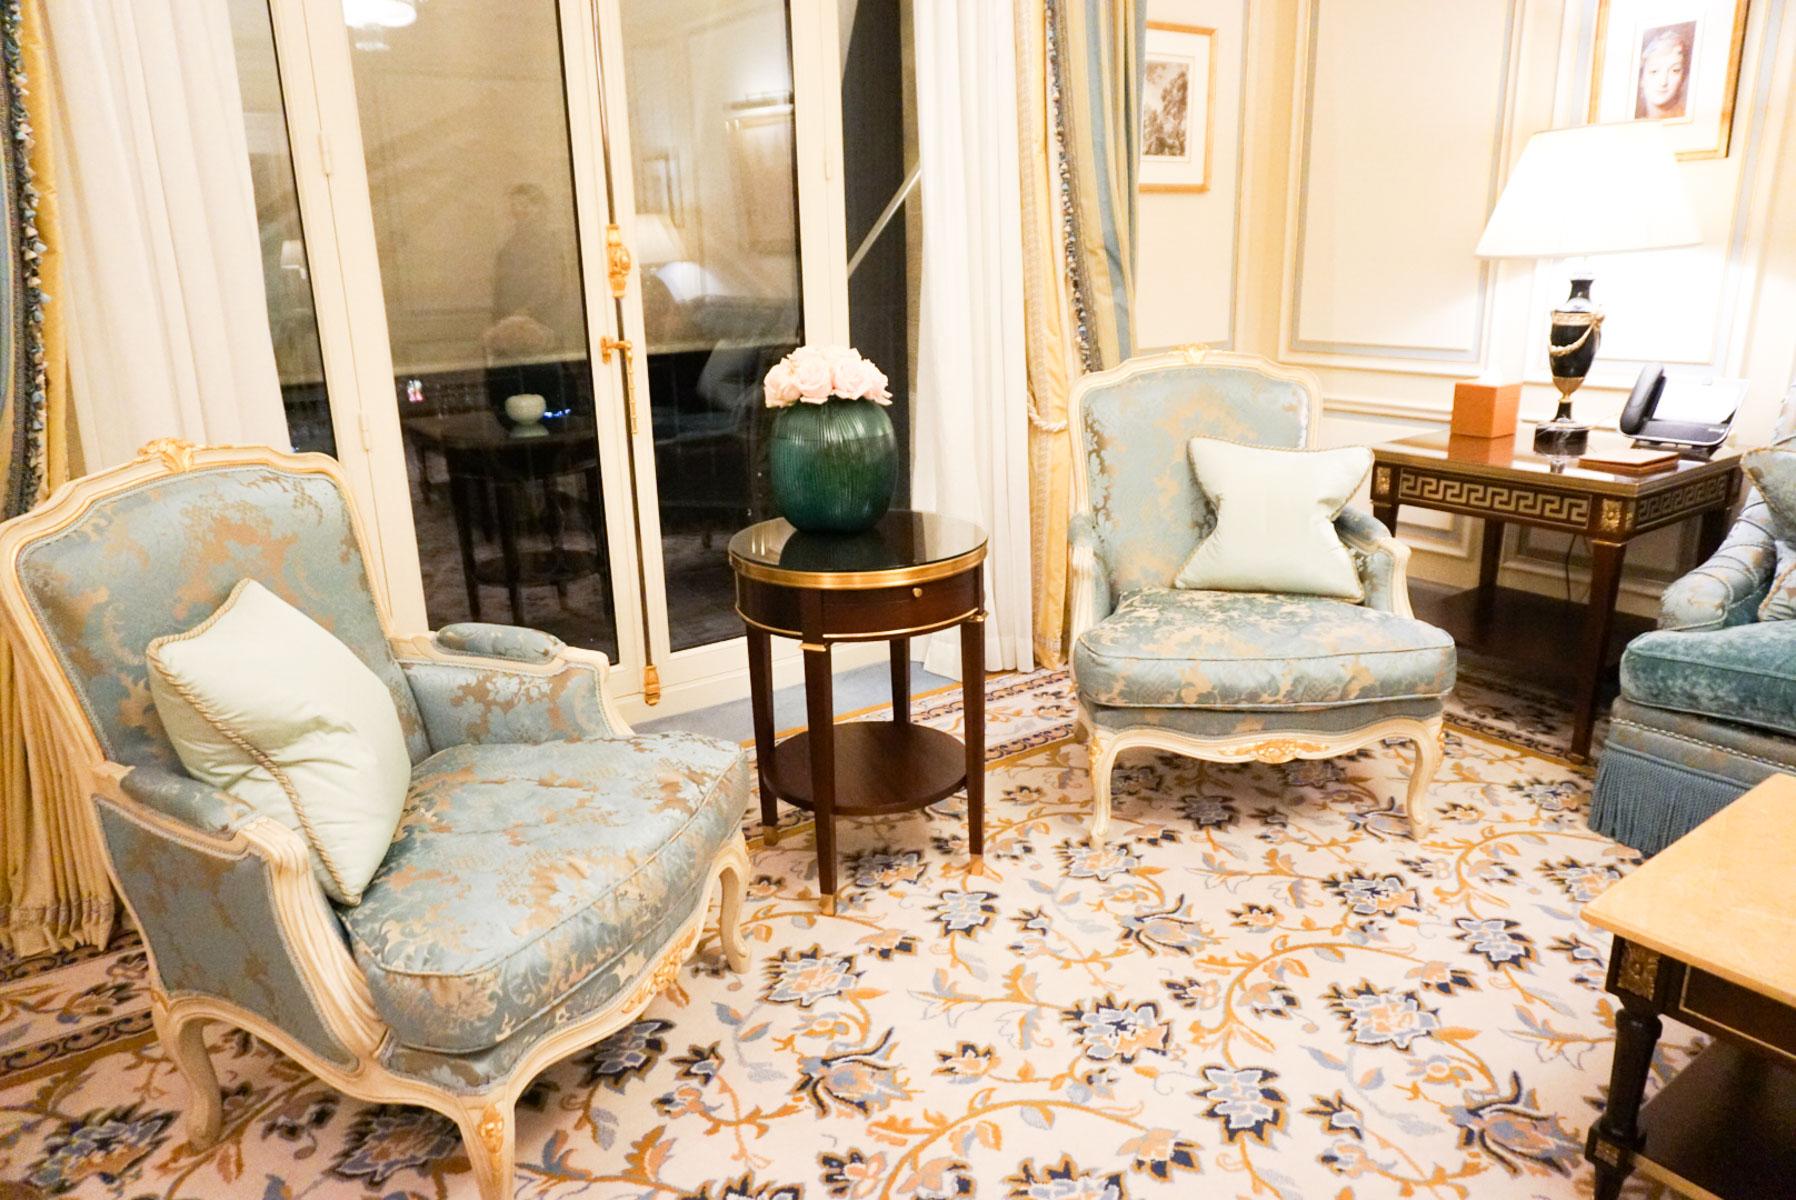 Hotel_Ritz_Paris_Trip_to_Paris-2570.jpg